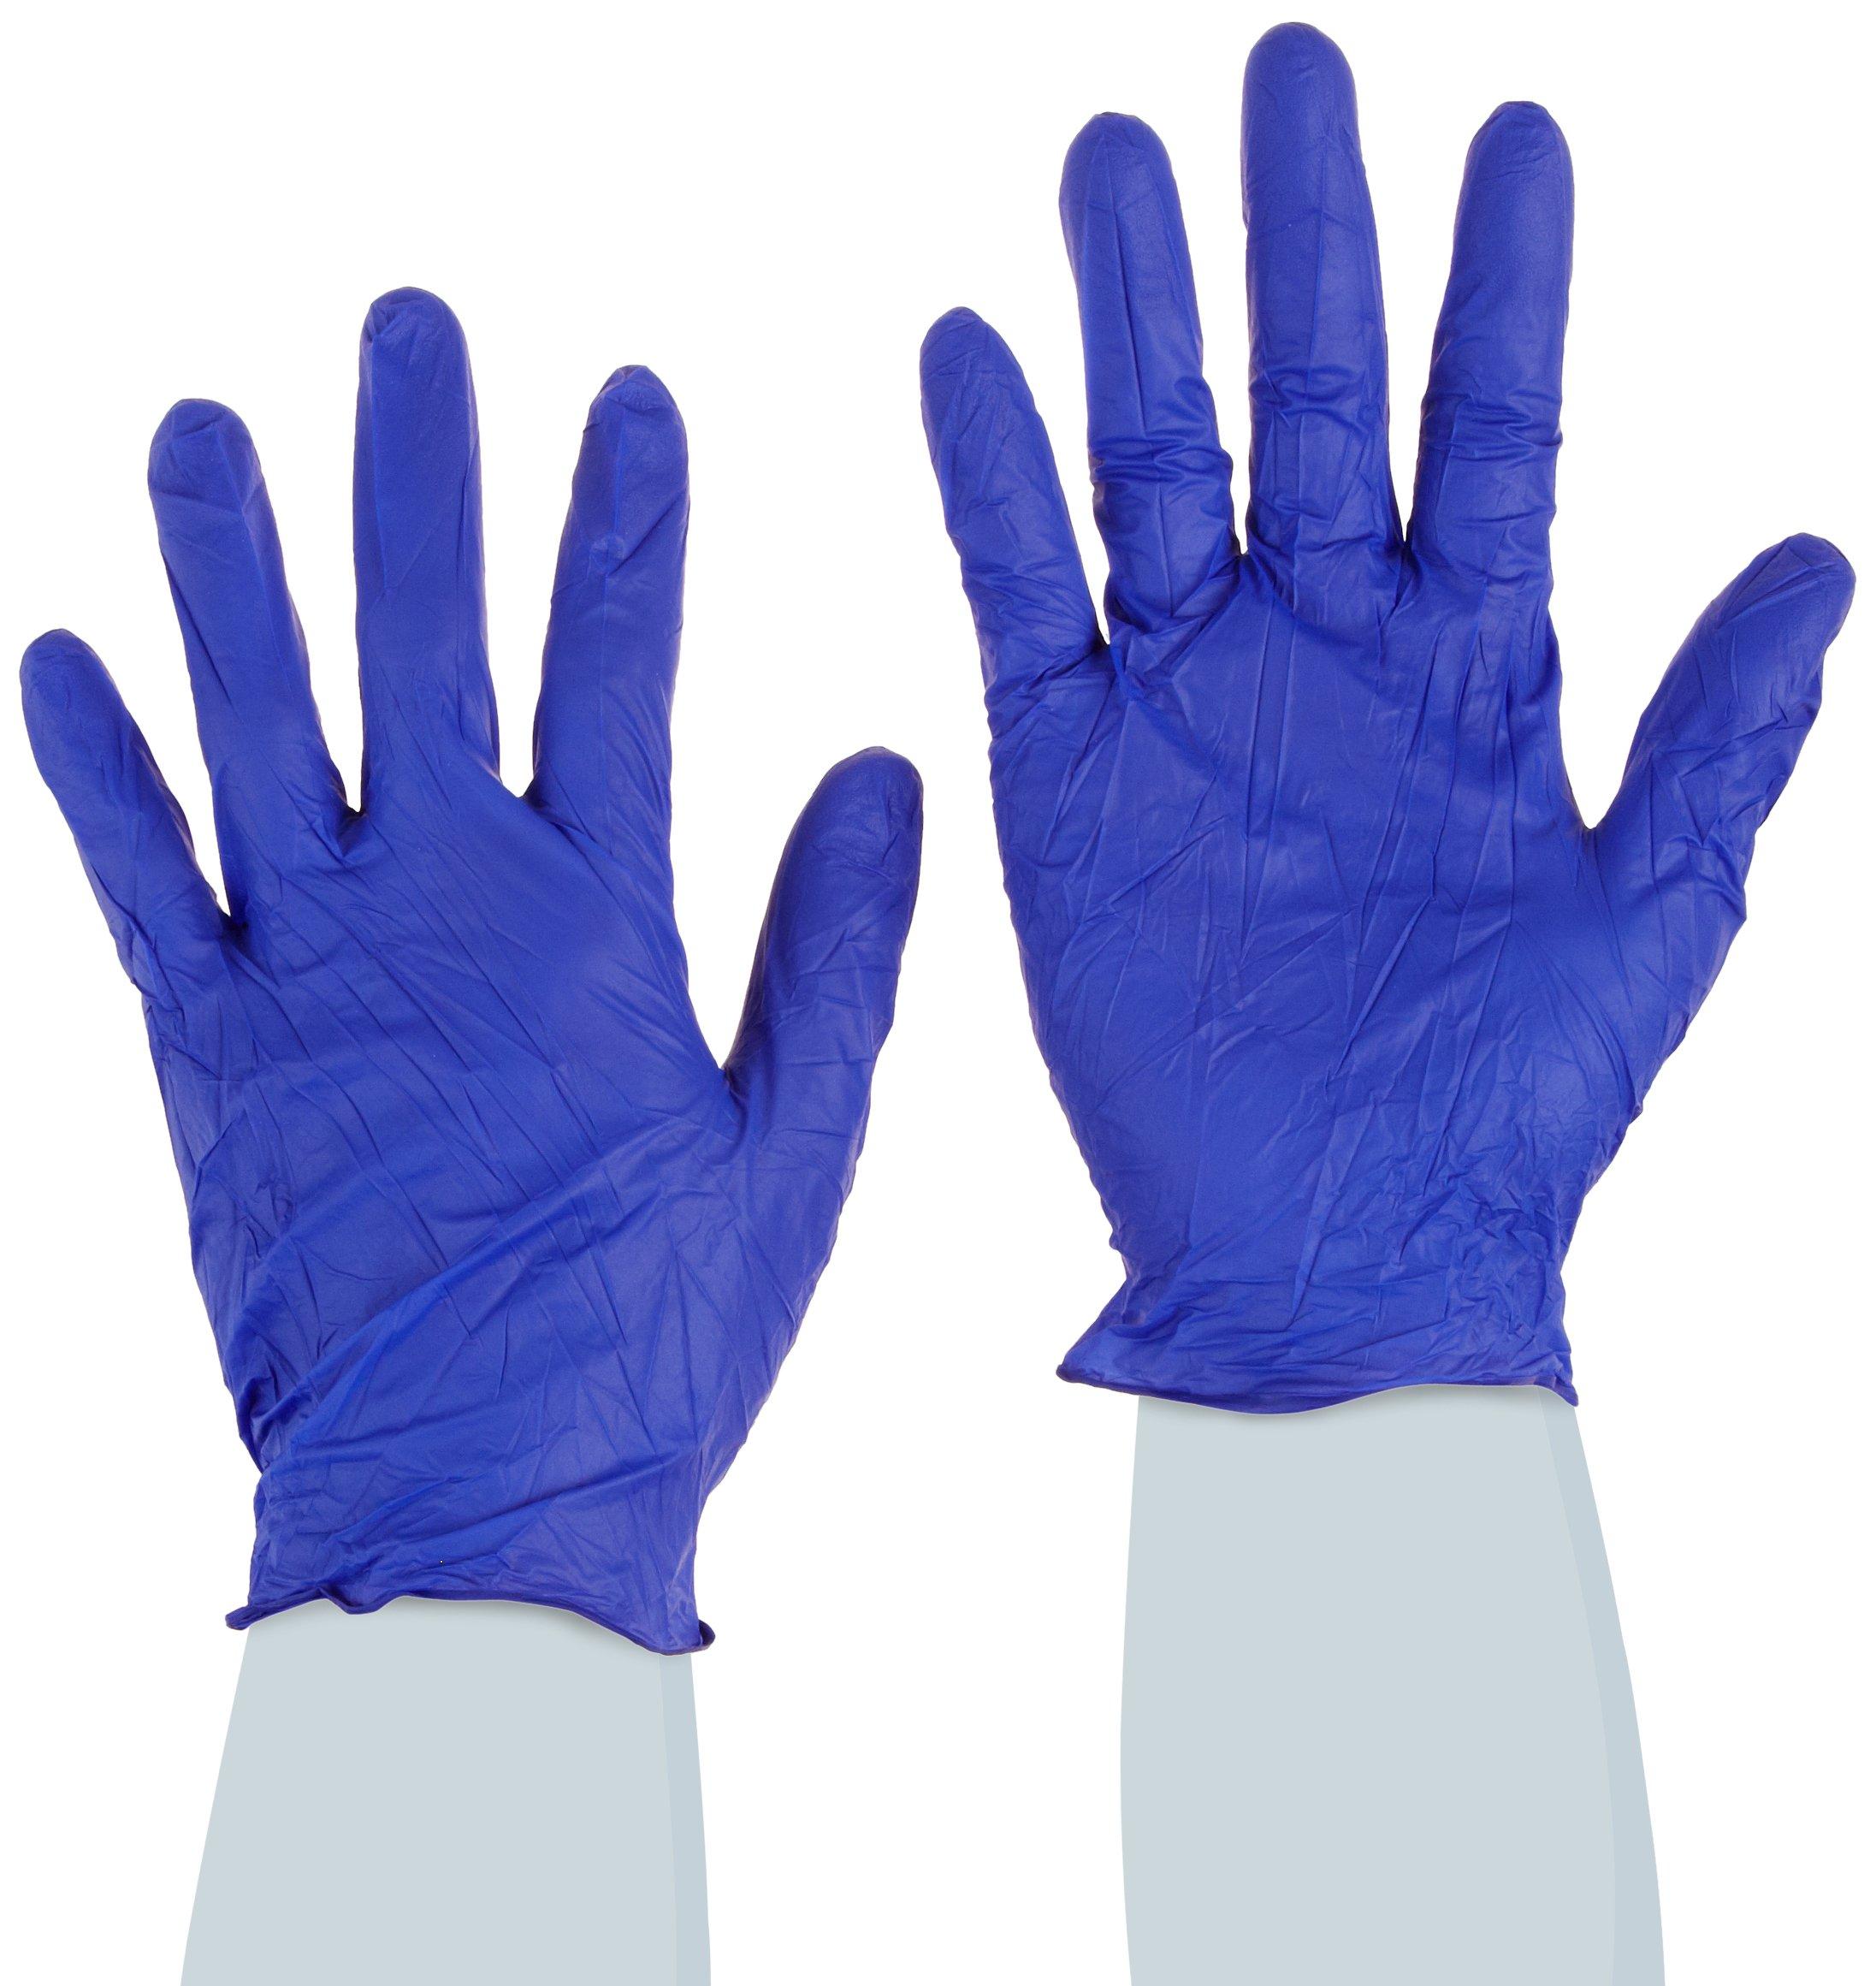 Microflex UF524XL Ultraform Powder Free Nitrile Glove Size Extra Large (Box of 250)